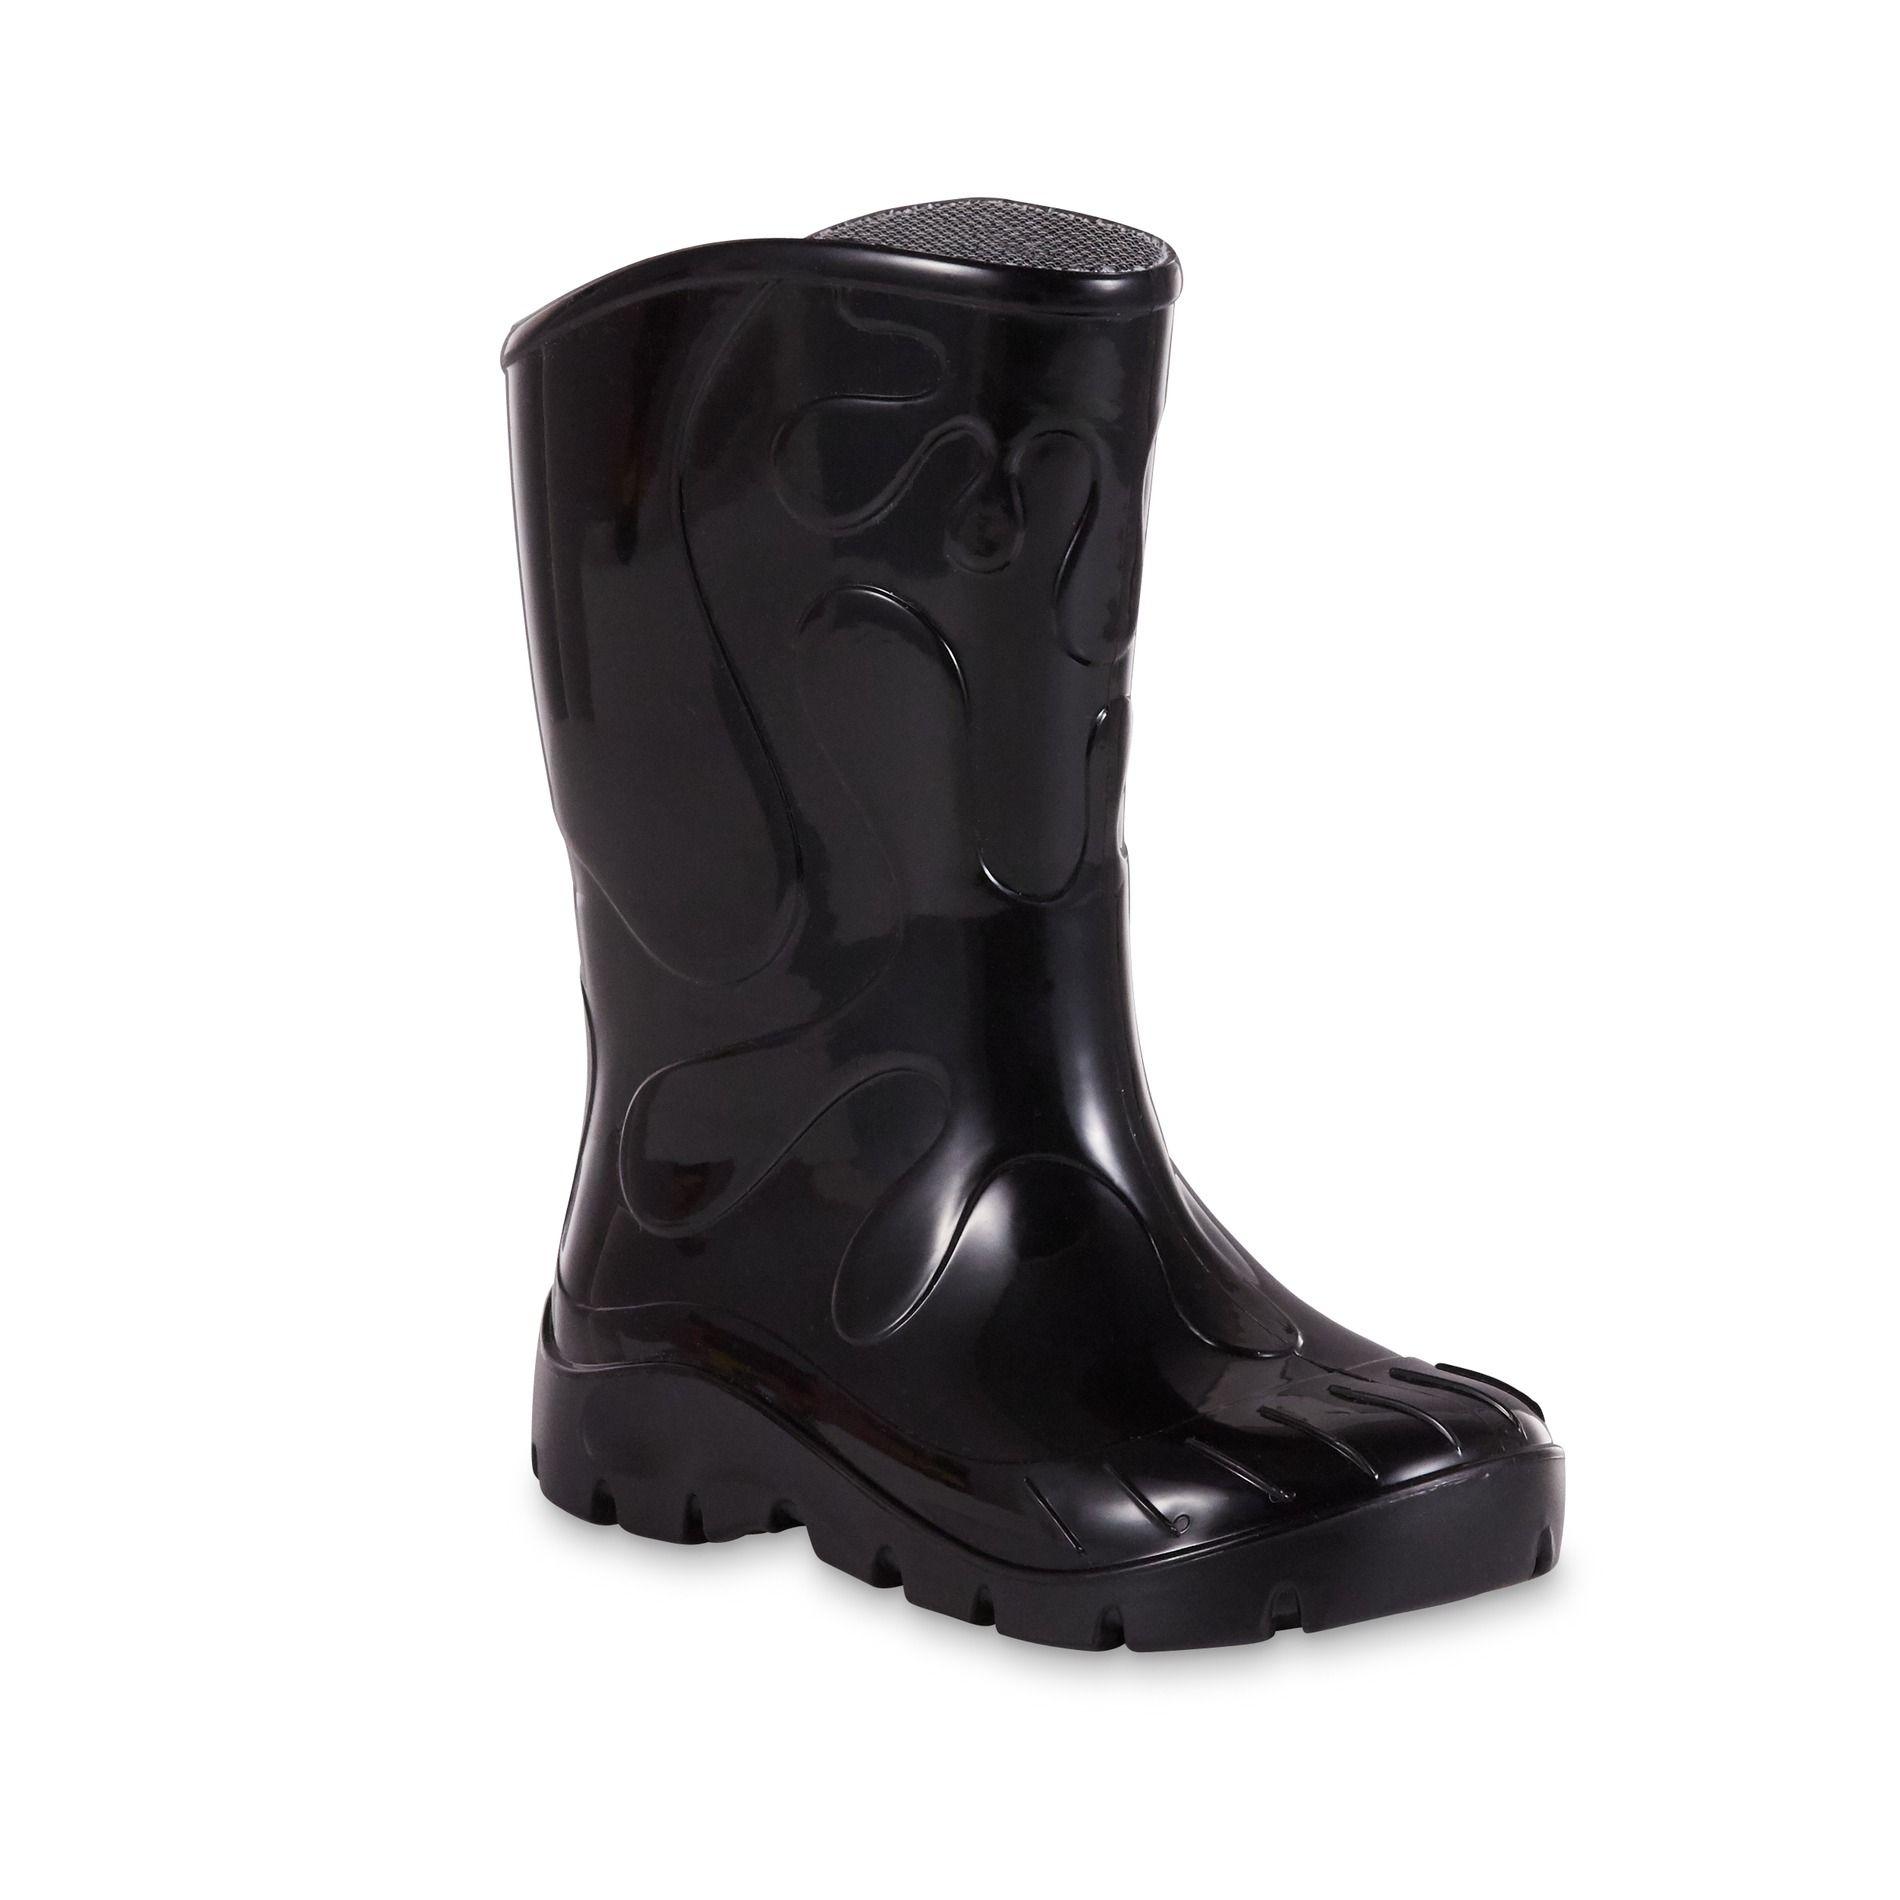 Skeeper Boys Black Rain Boot Size 12 Toddler Youth Girls Rain Boots Black Rain Boots Boys Rain Boots